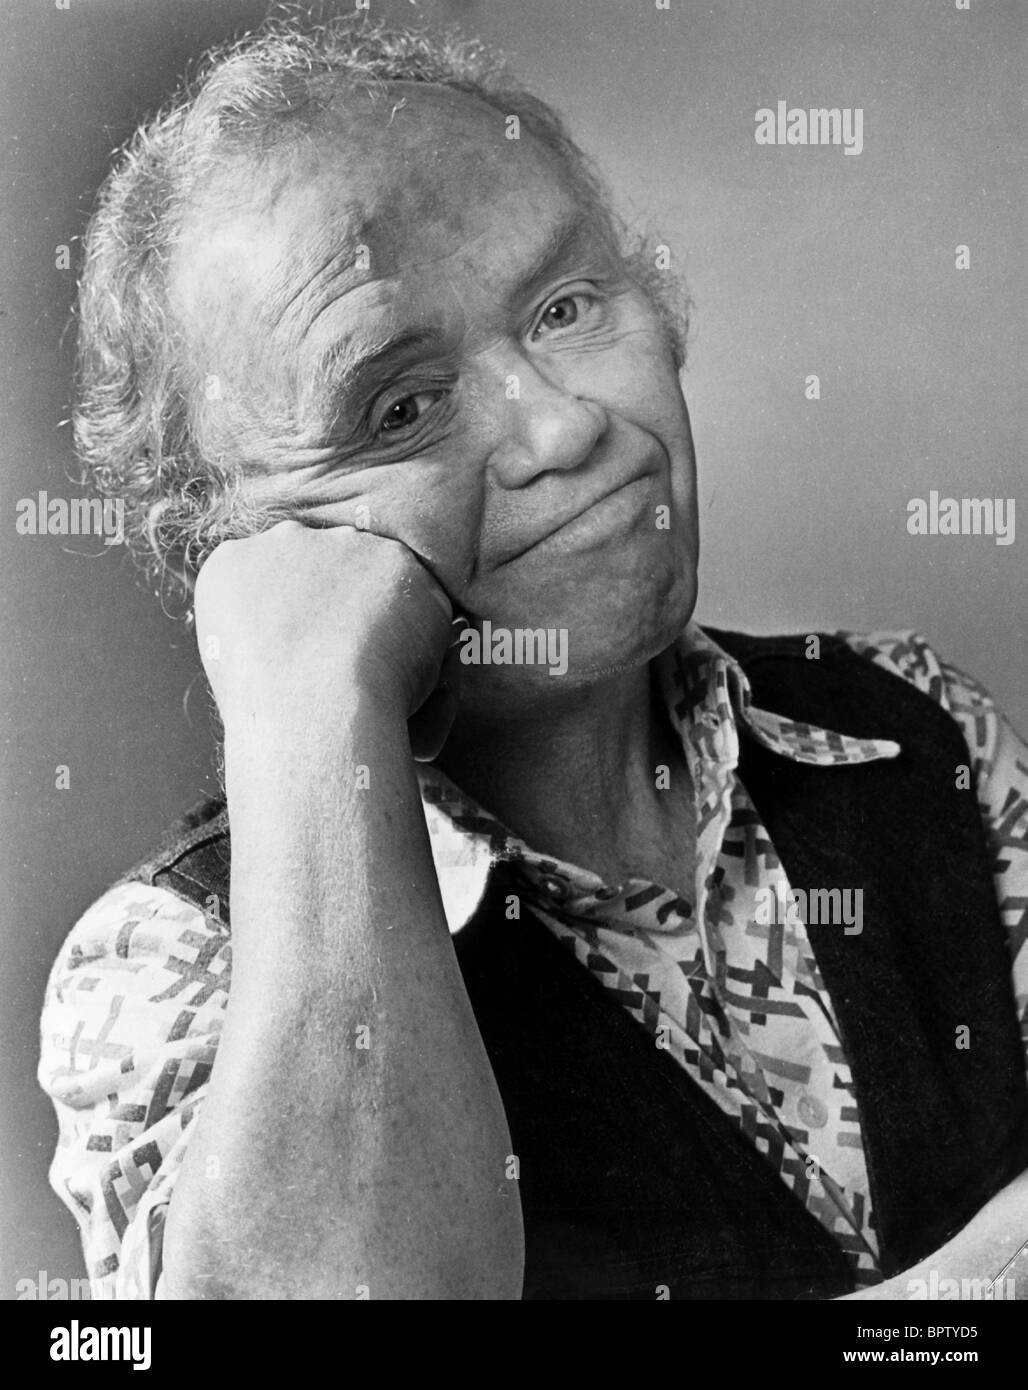 CHARLIE DRAKE ACTOR (1988) - Stock Image